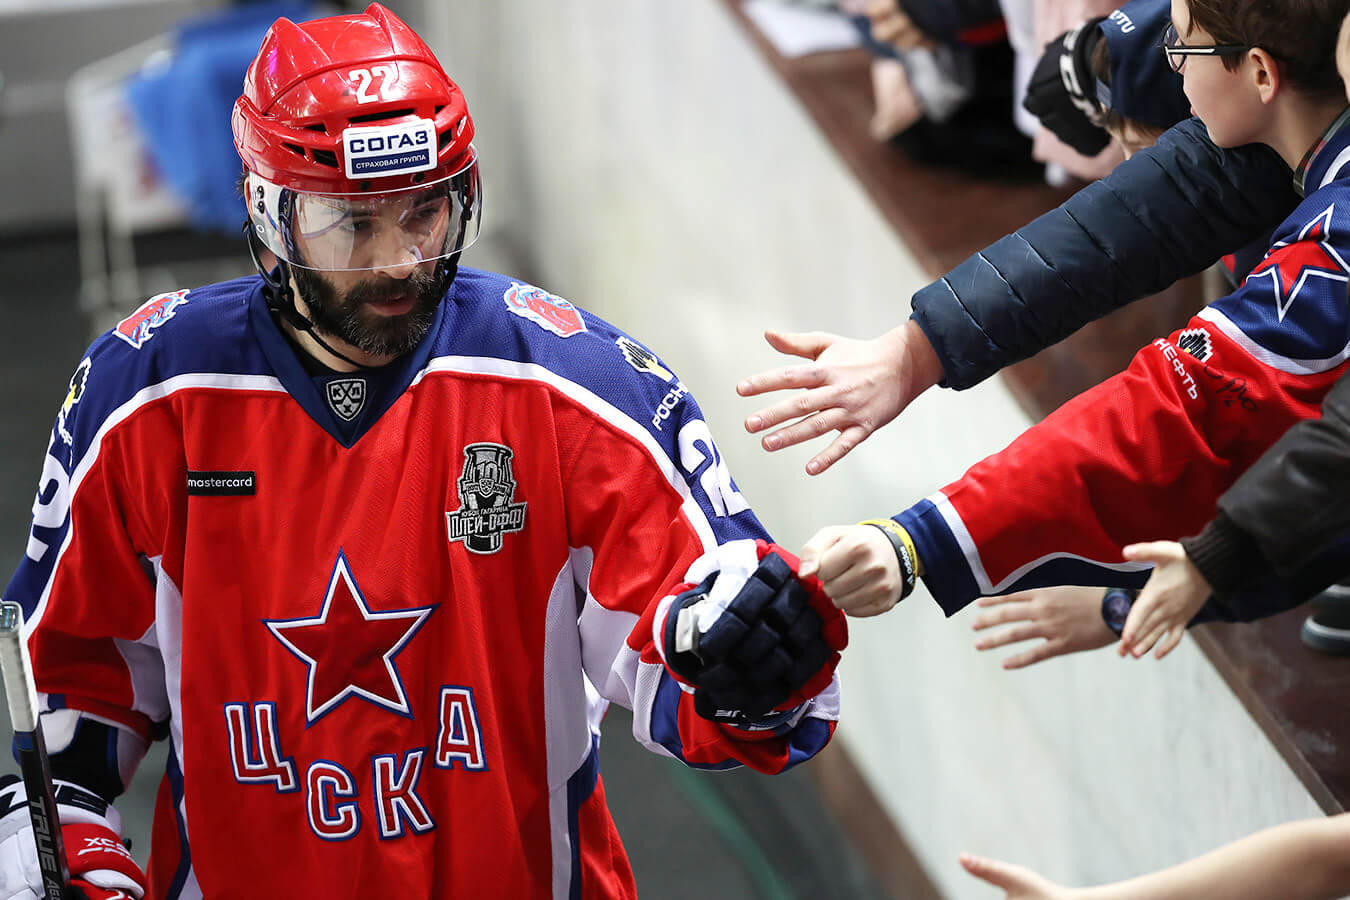 Воспитанник ангарского хоккея Александр Попов